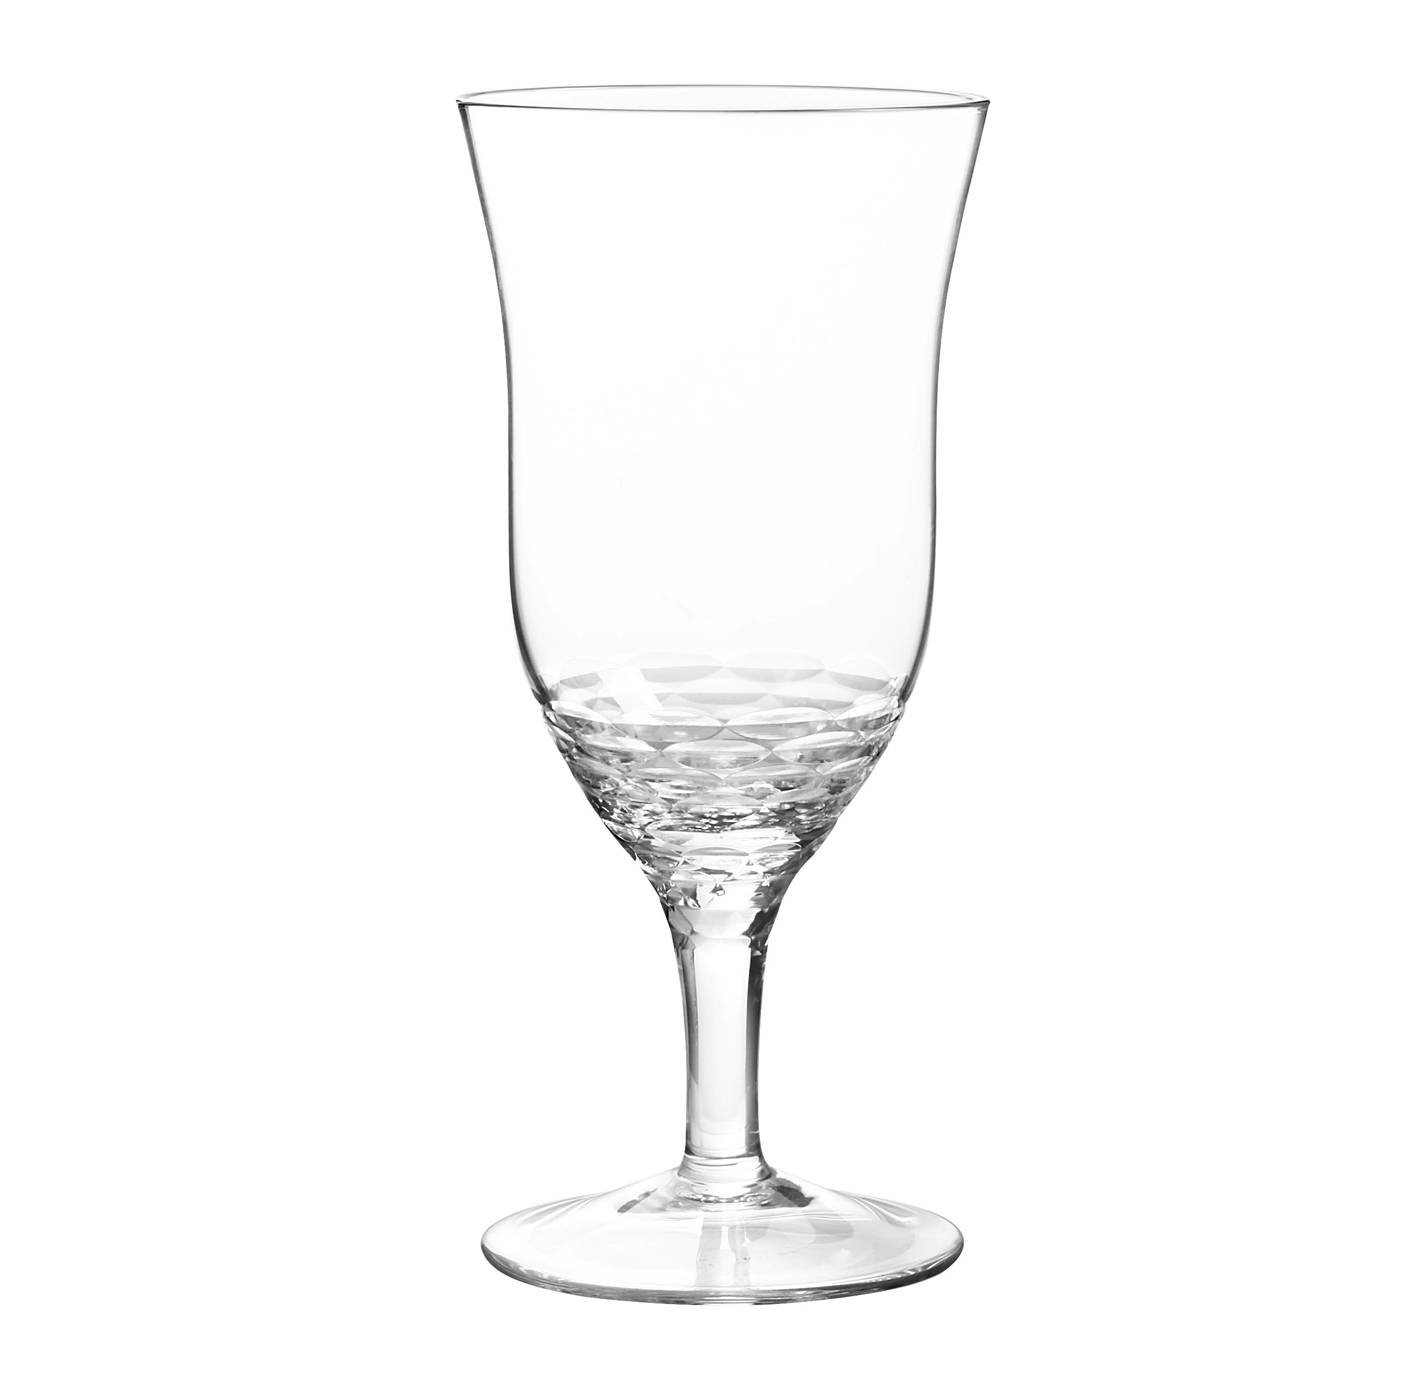 Qualia Glass Q251007 Reef Iced Tea/Beverage Glasses, 20 oz, Clear